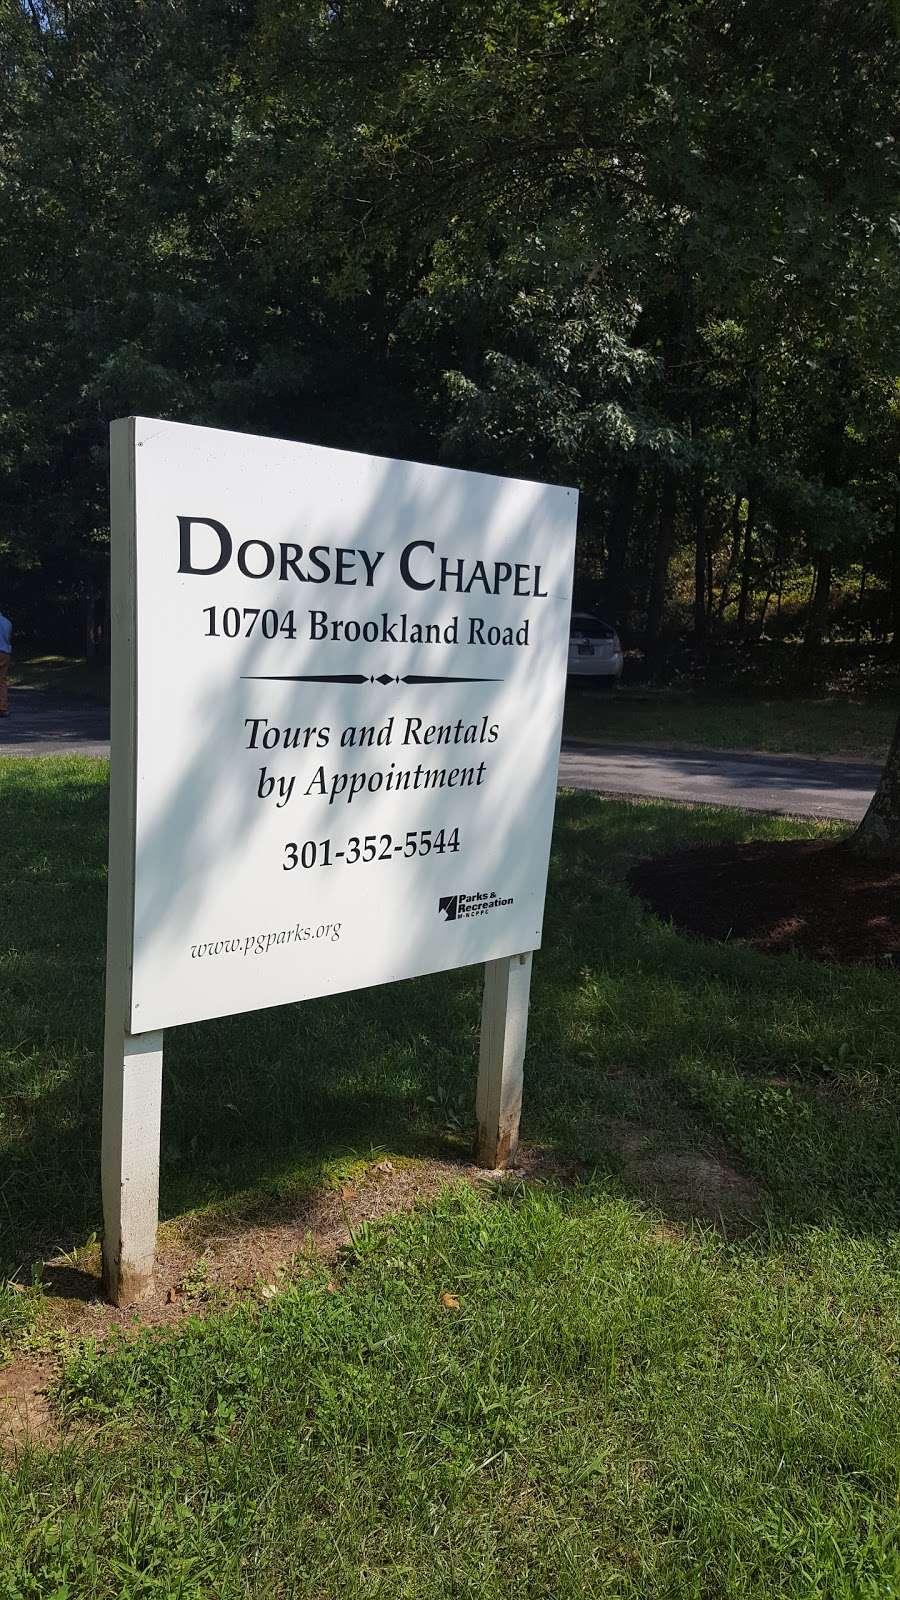 Dorsey Chapel - church  | Photo 8 of 10 | Address: 10704 Brookland Rd, Glenn Dale, MD 20769, USA | Phone: (301) 352-5544